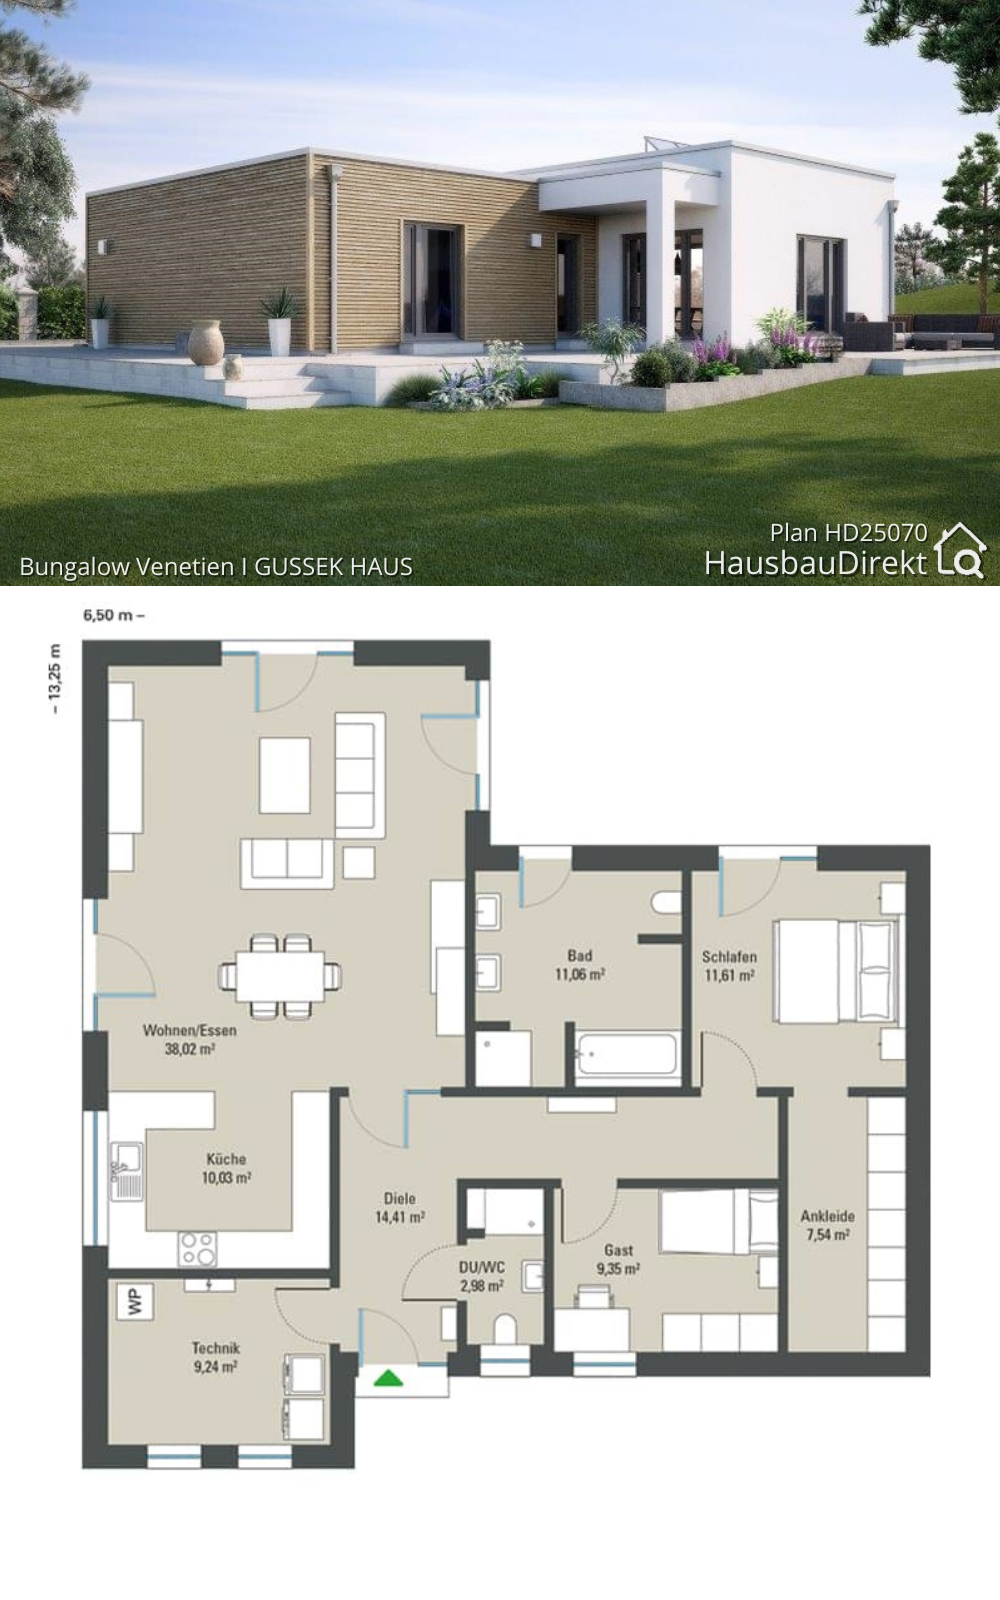 Modern Bungalow House Floor Plans with Flat Roof & 2 Bedroom European Minimalist Design Ideas